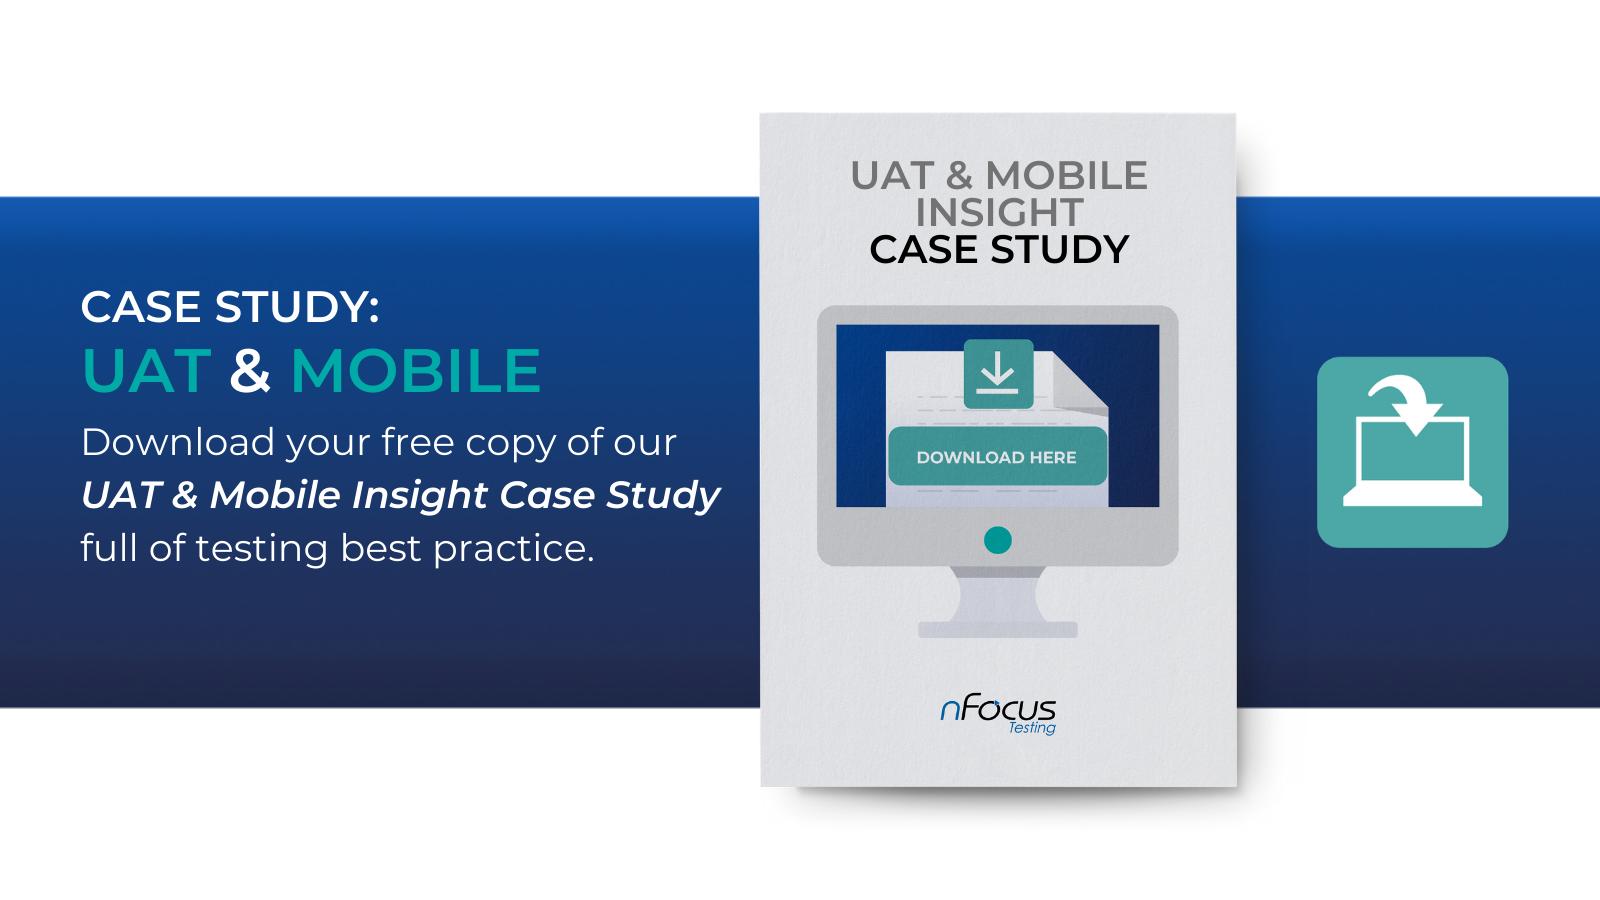 UAT & Mobile Insight Case Study